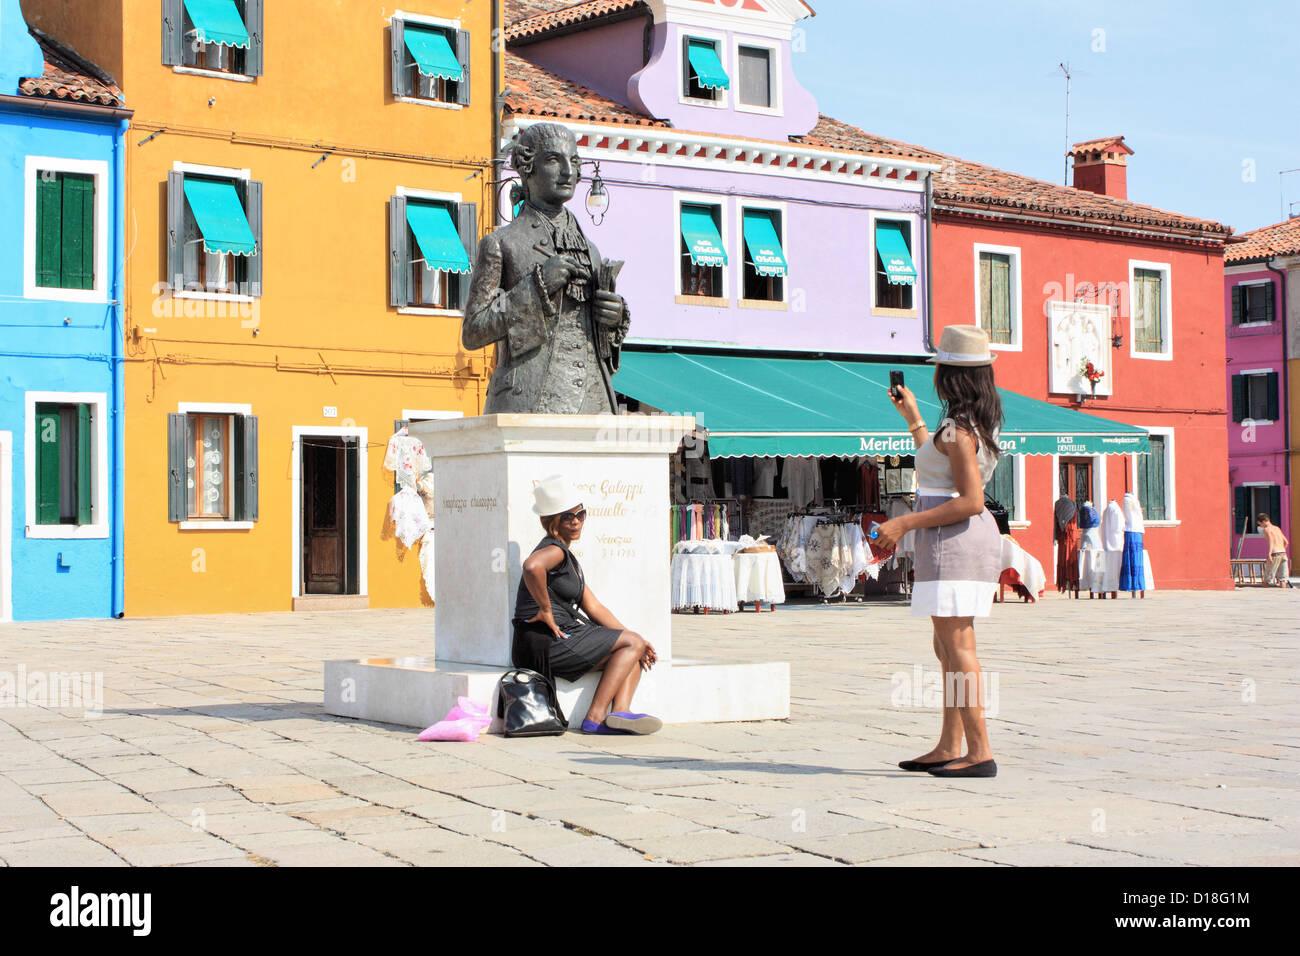 Memorial of Baldassaare Galuppi, Burano Island, Isola di Burano Island, Venice - Stock Image